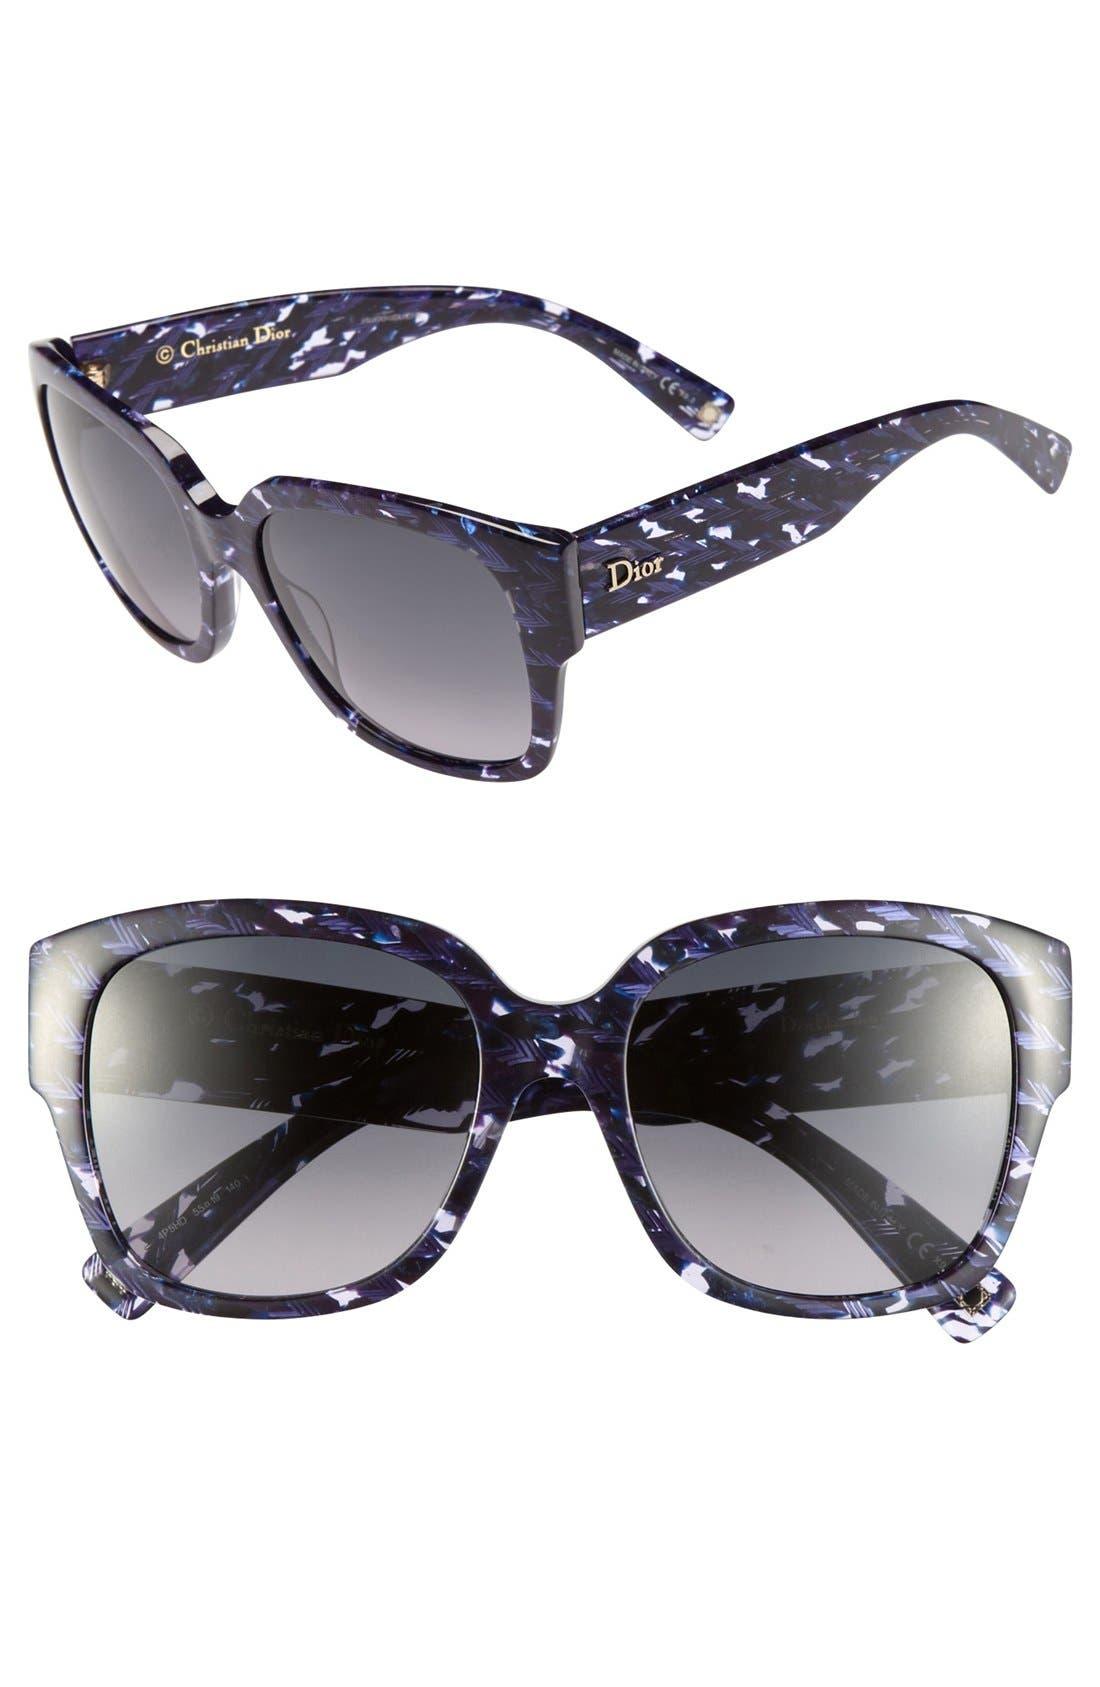 Main Image - Dior 'Flanelle' 55mm Sunglasses